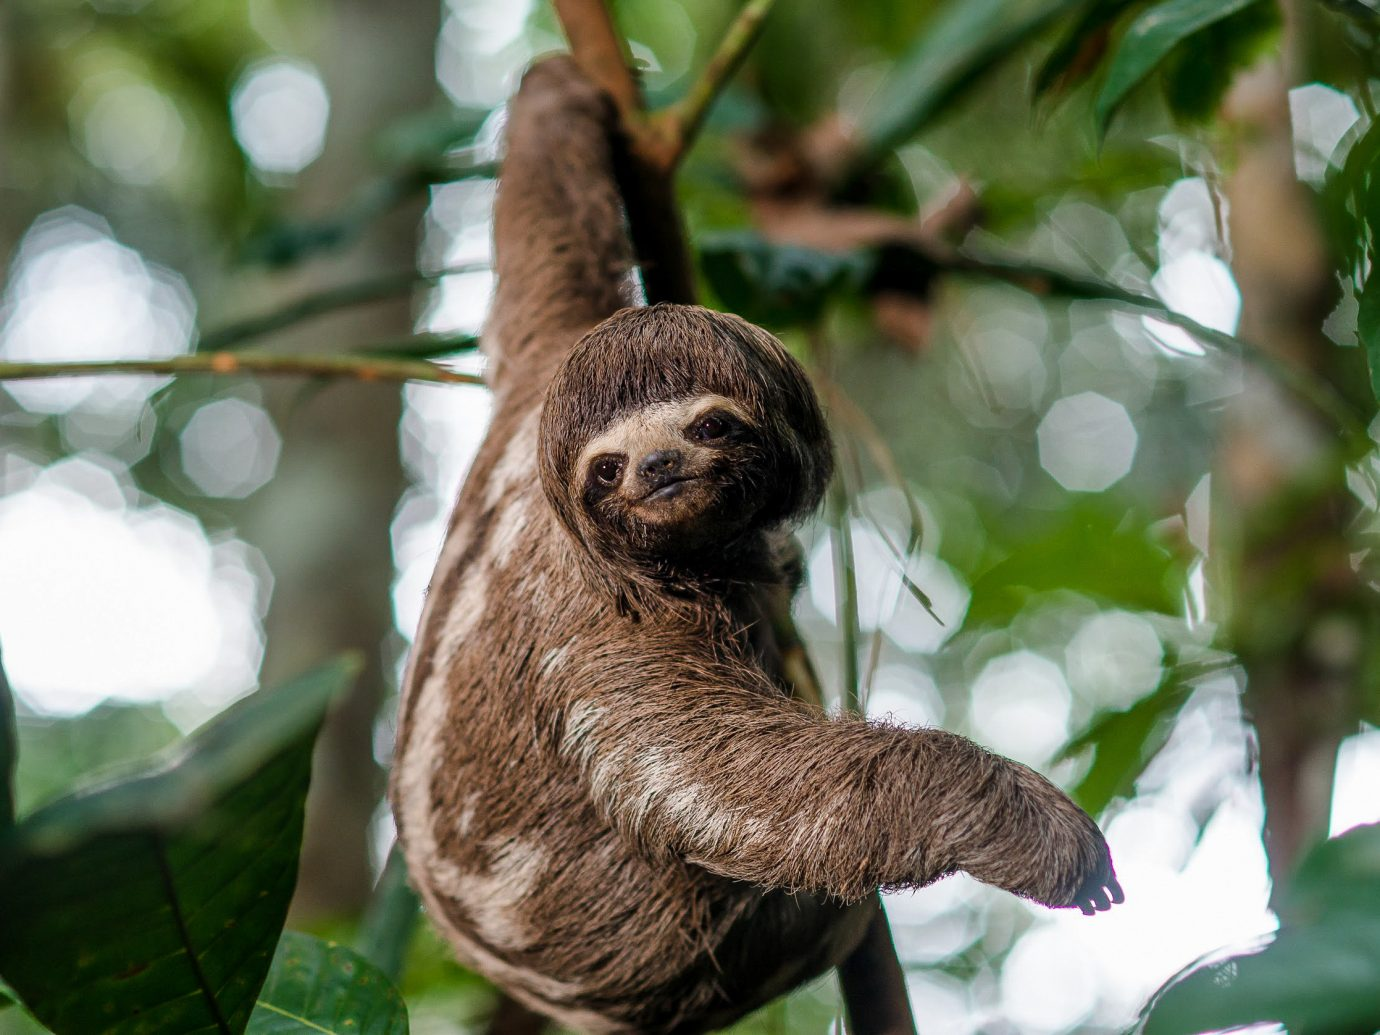 Cruise Travel Luxury Travel Outdoors + Adventure Travel Tips Trip Ideas tree sloth animal mammal outdoor fauna three toed sloth terrestrial animal leaf organism rainforest Jungle branch Wildlife snout